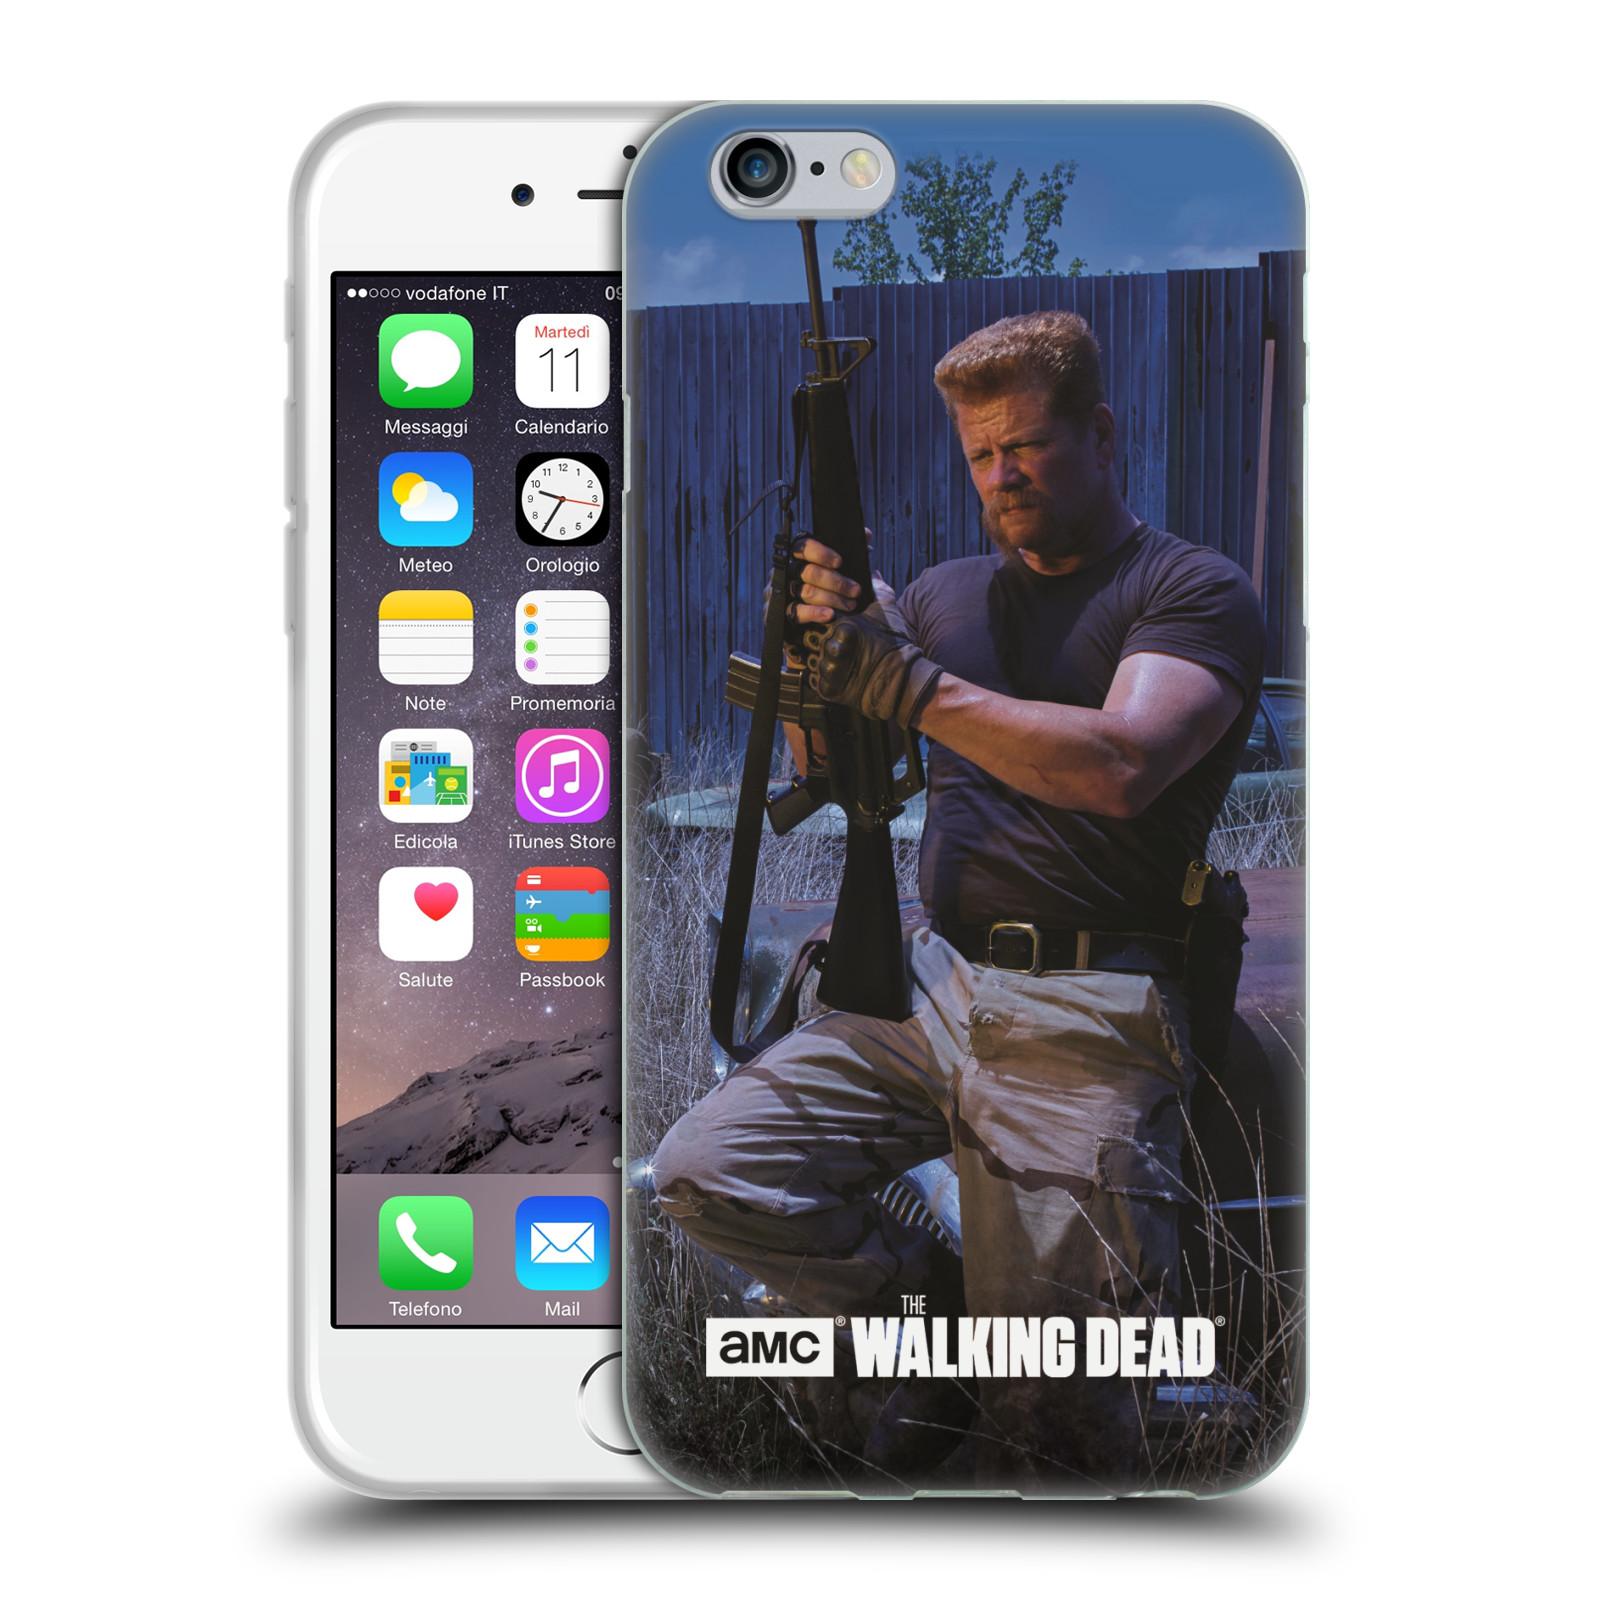 HEAD CASE silikonový obal na mobil Apple Iphone 6 / 6S originální potisk Walking Dead postavy v akci Abraham